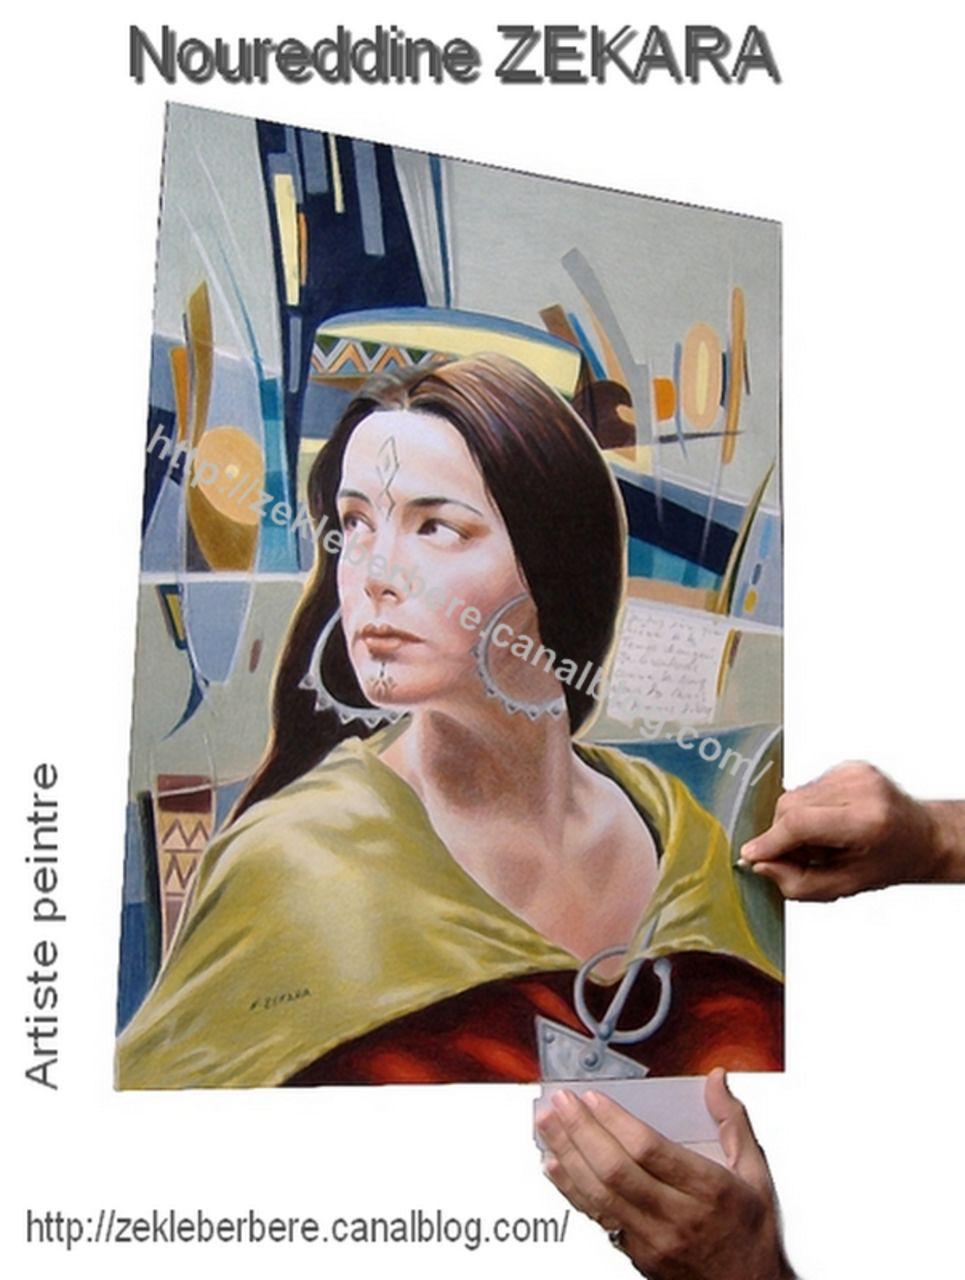 Noureddine ZEKARA Affiche - La Kahina